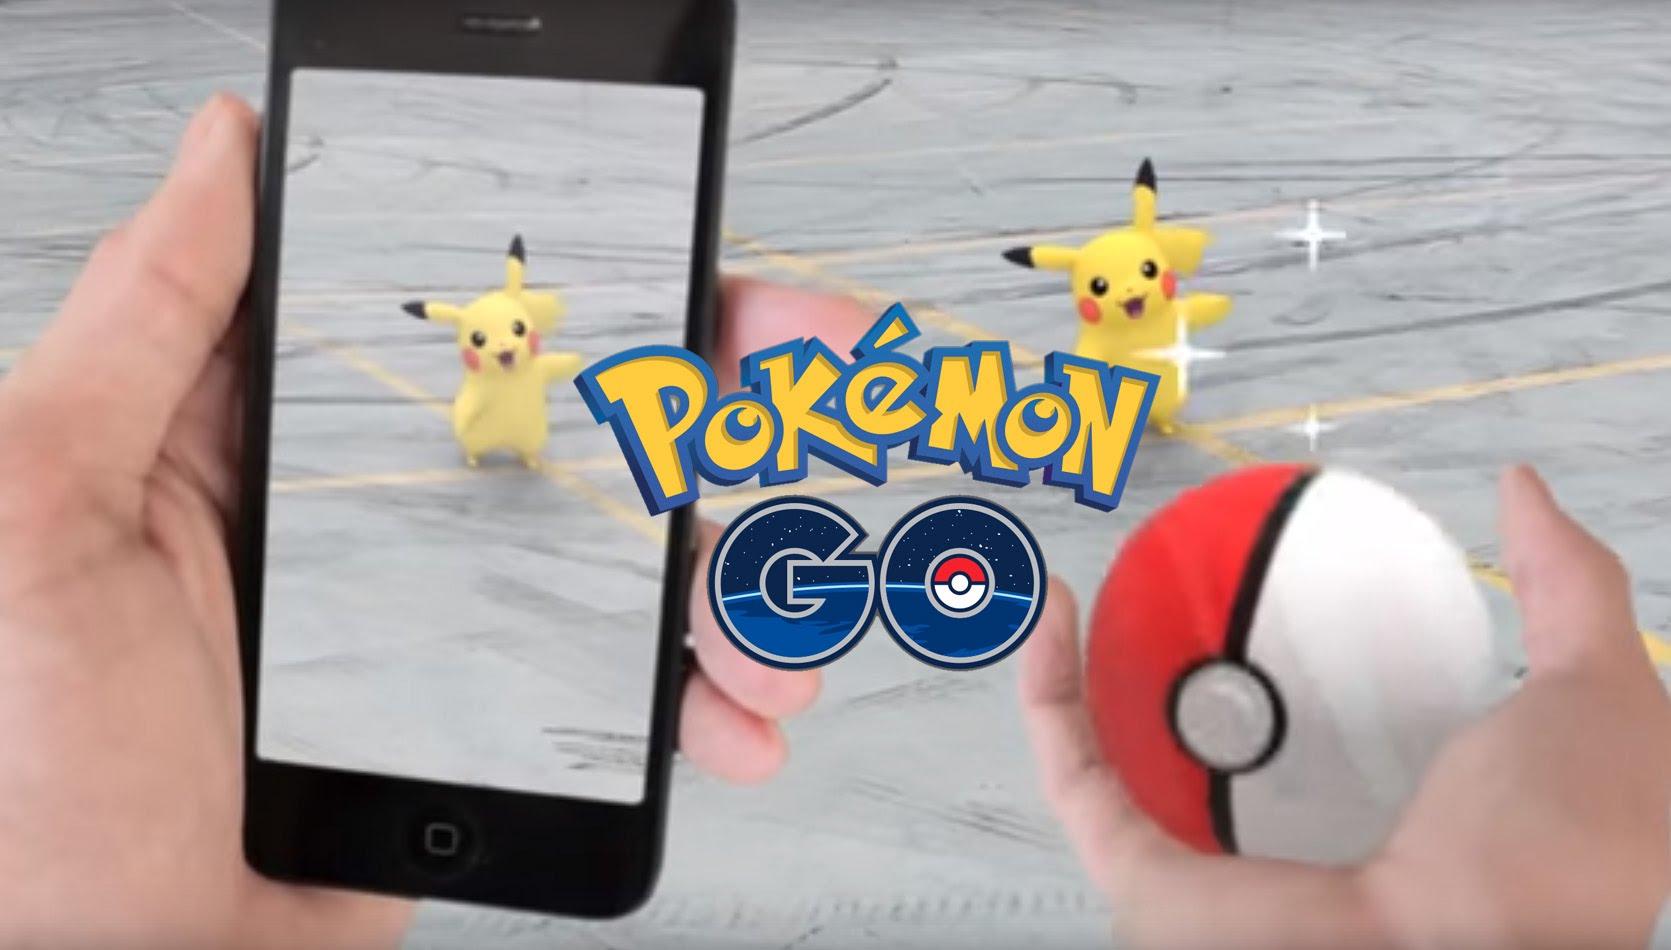 Is Pokemon Go better than online casinos?